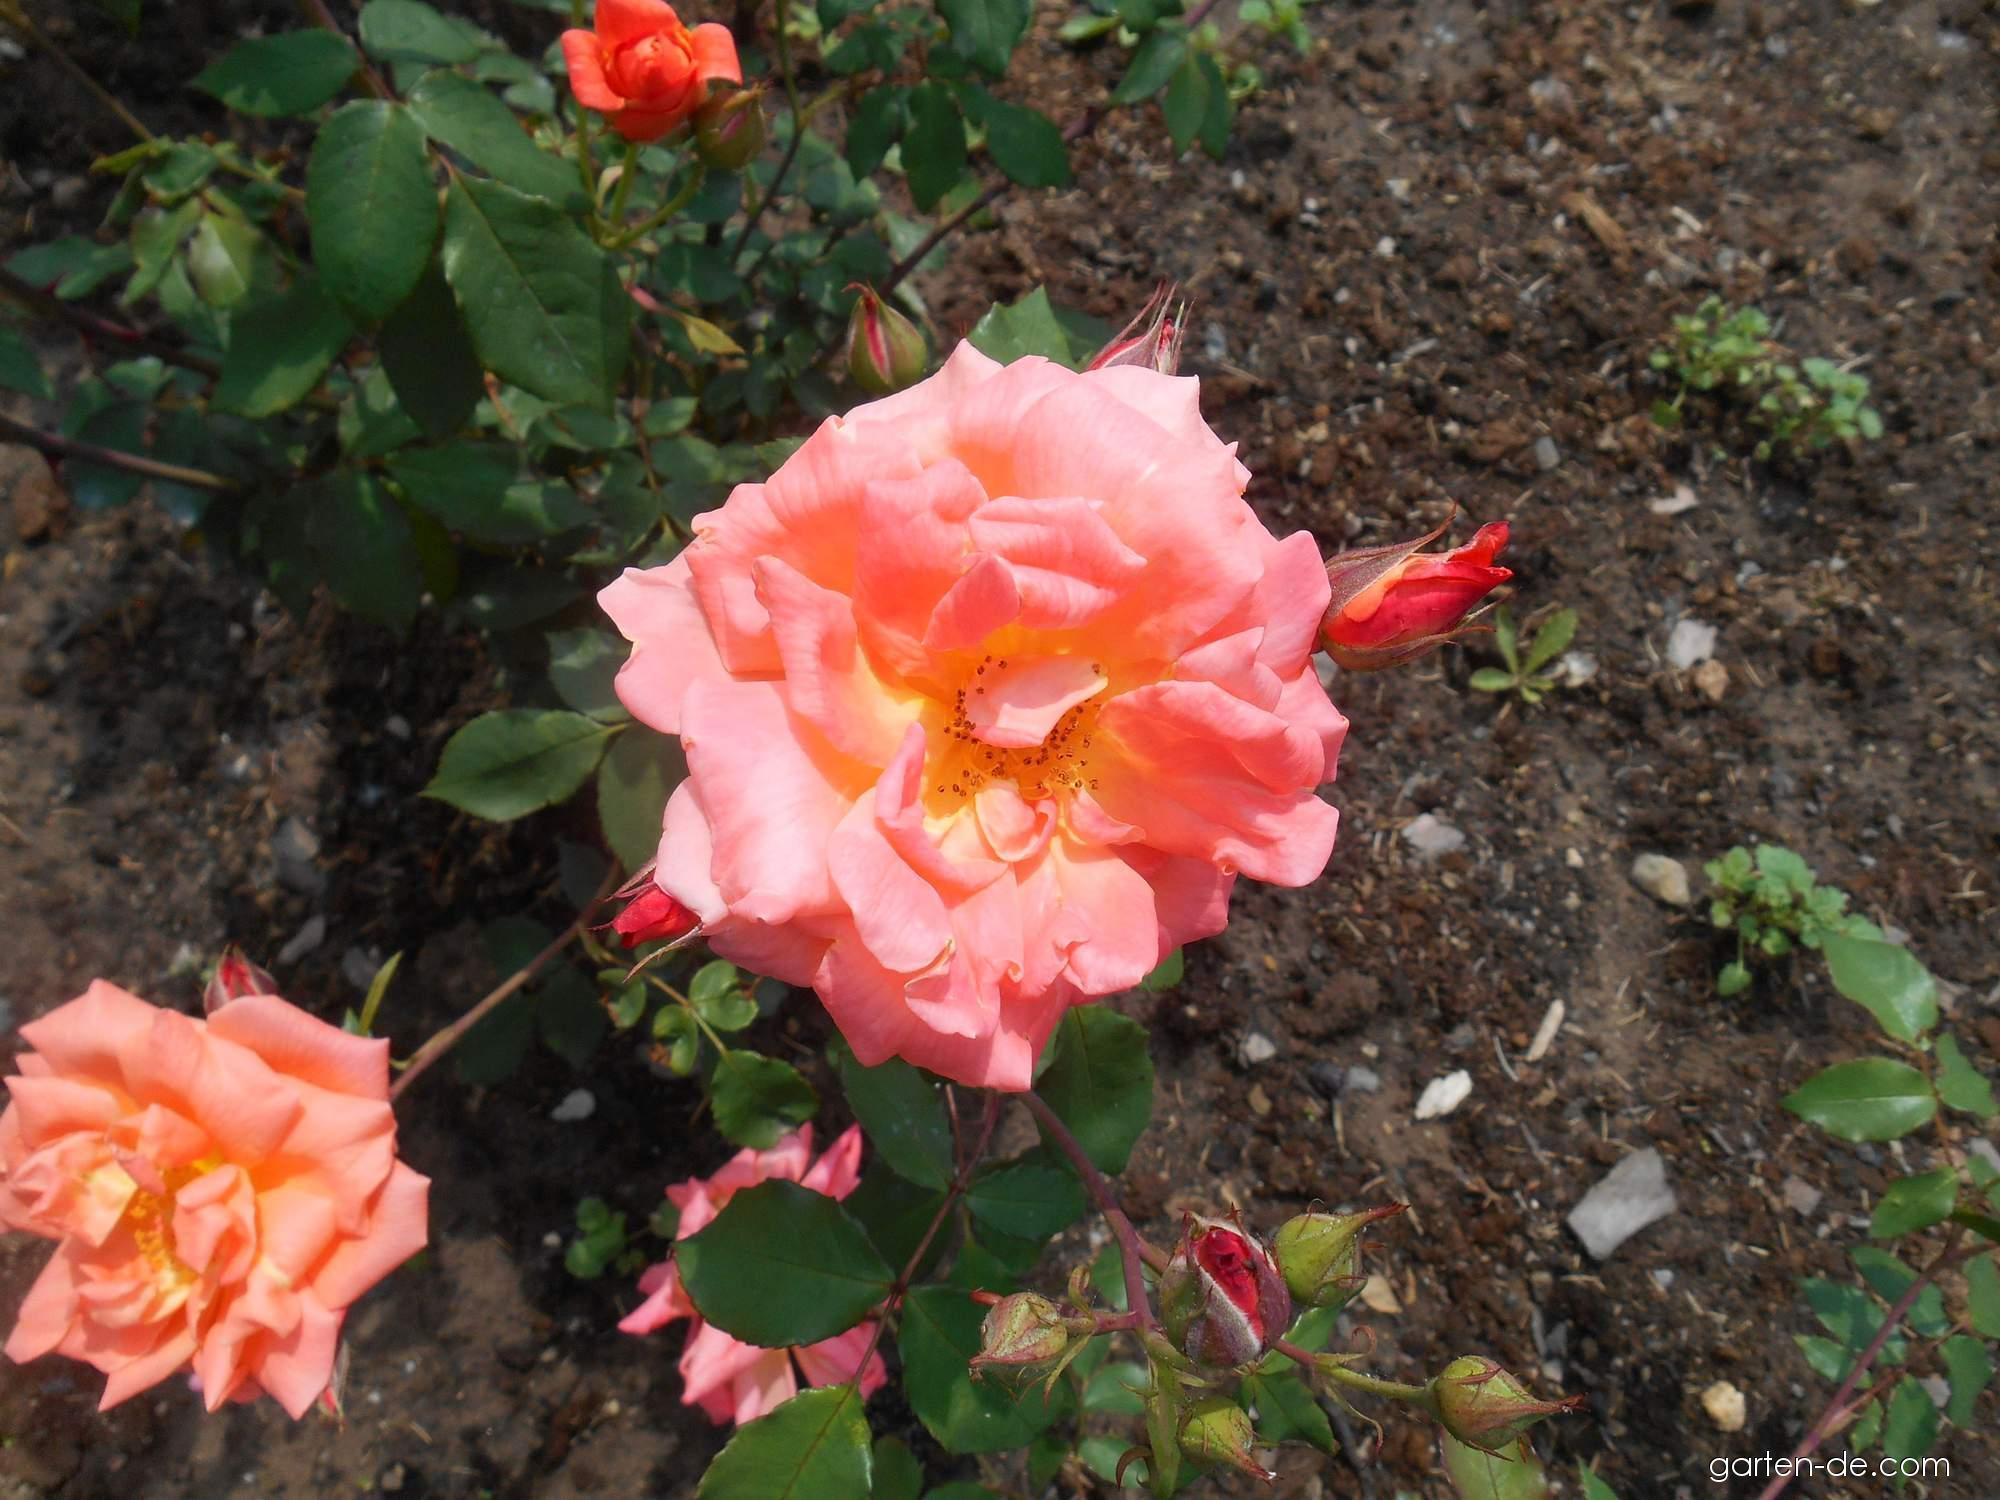 Rose - Rosa Plamja Vostoka